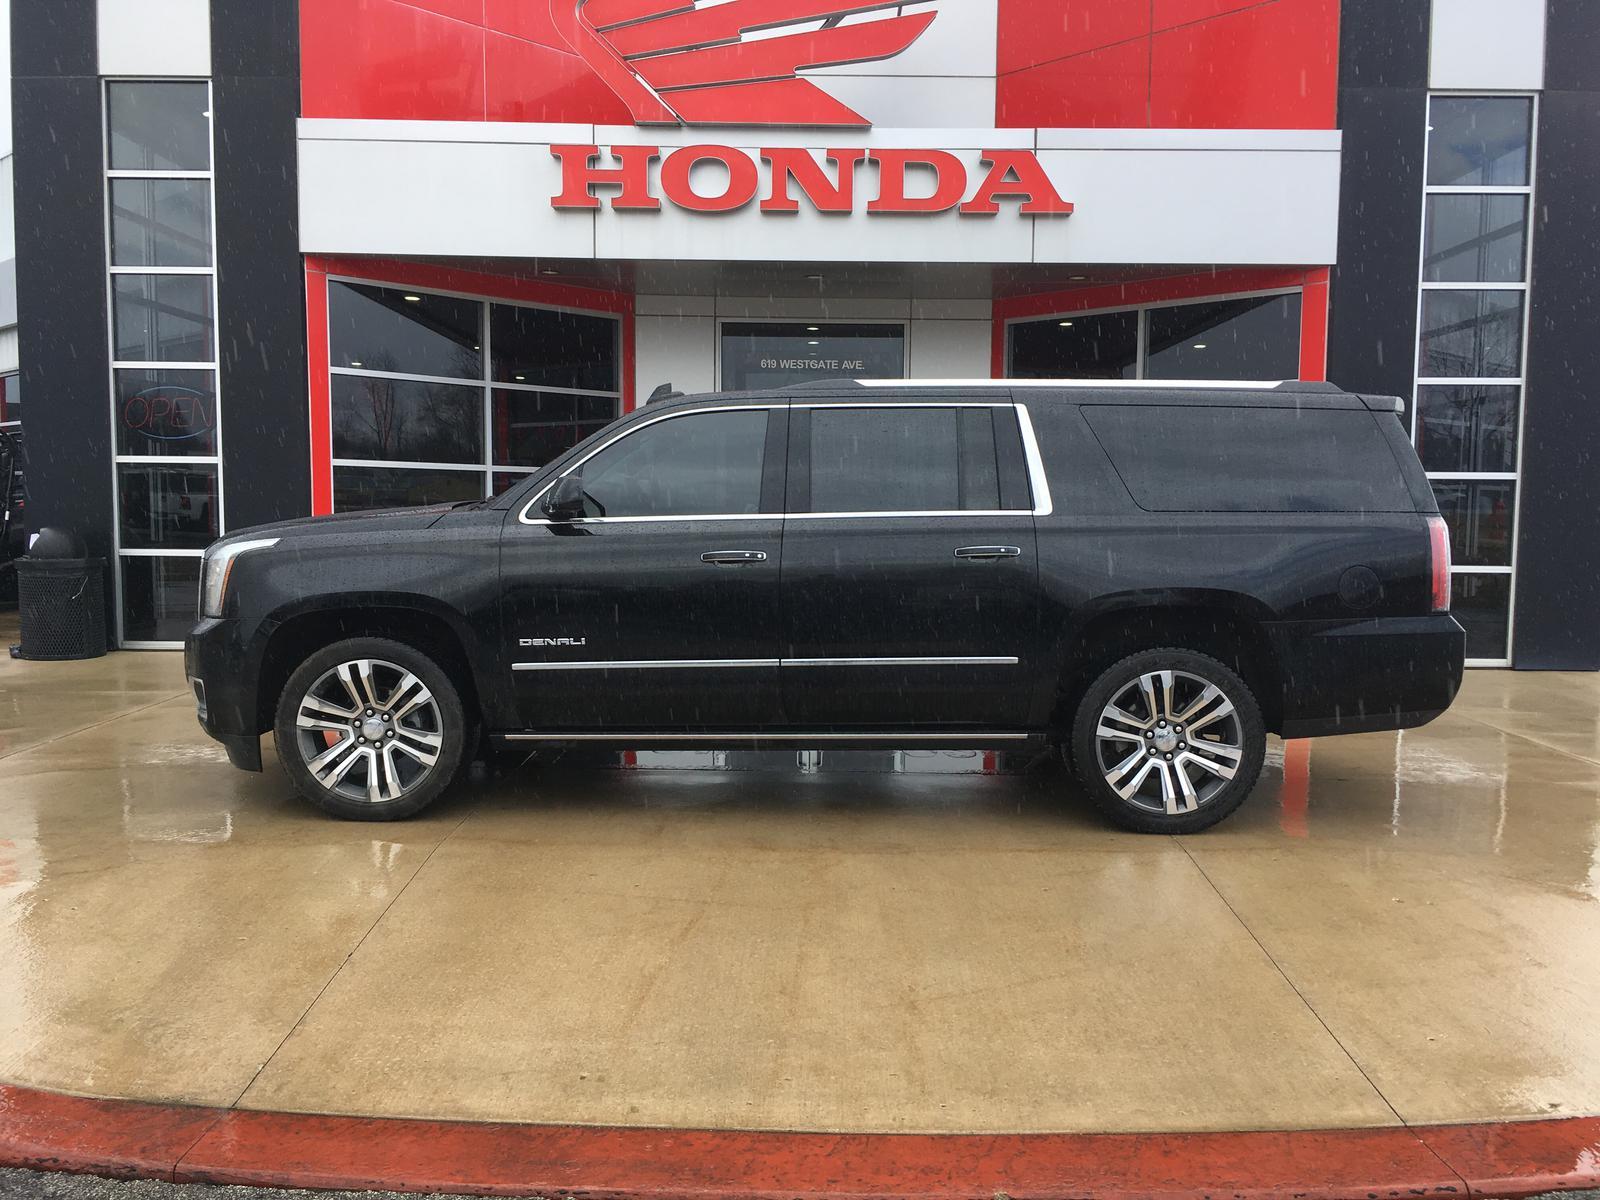 Inventory From Honda Kubota And Gmc Kendallville Powersports Kendallville In 800 888 5153